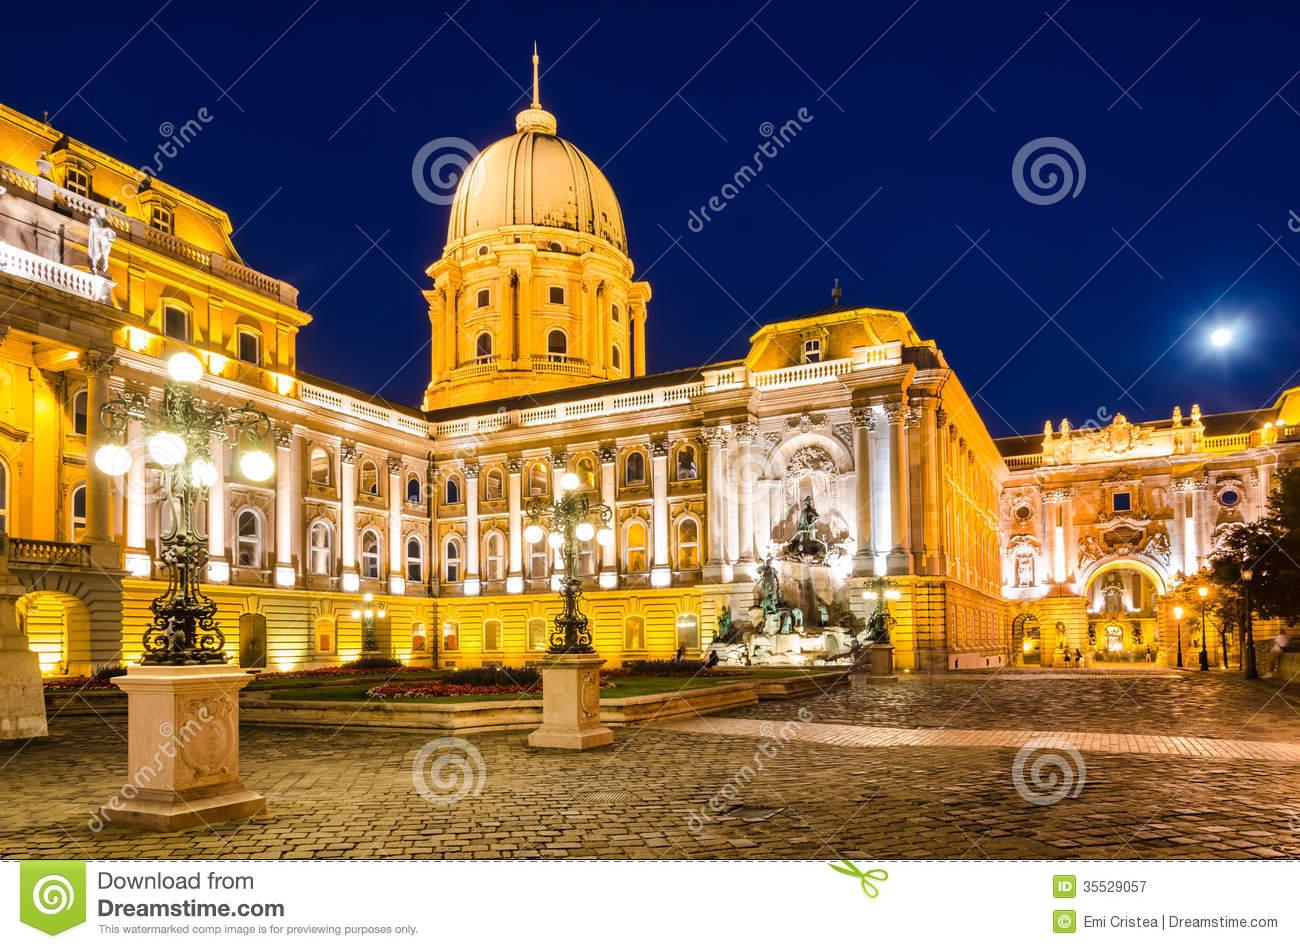 Courtyard, Buda Castle, Royal Palace In Budapest Stock Photo.